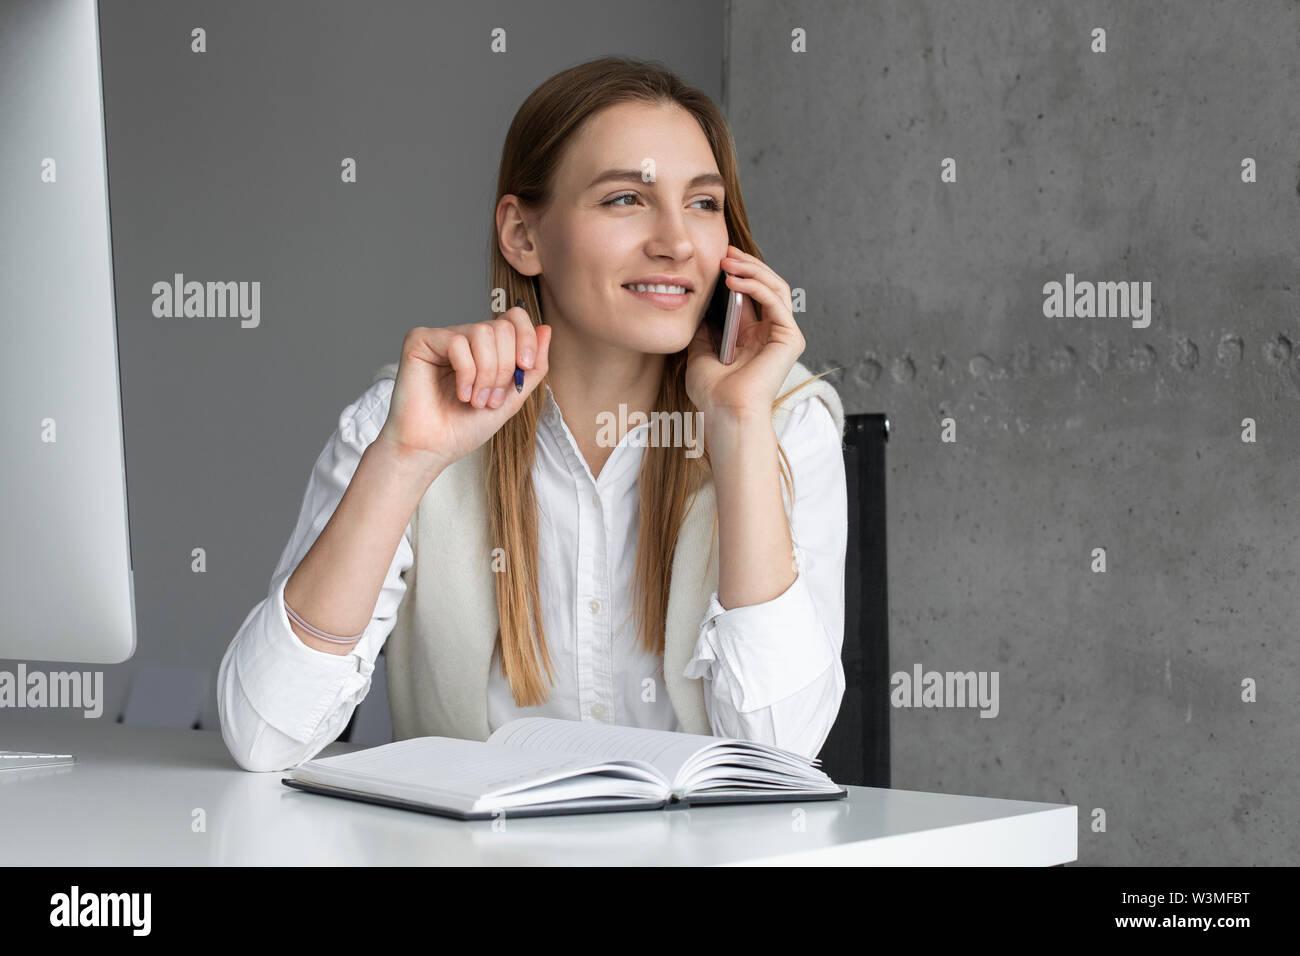 Businesswoman talking on phone - Stock Image